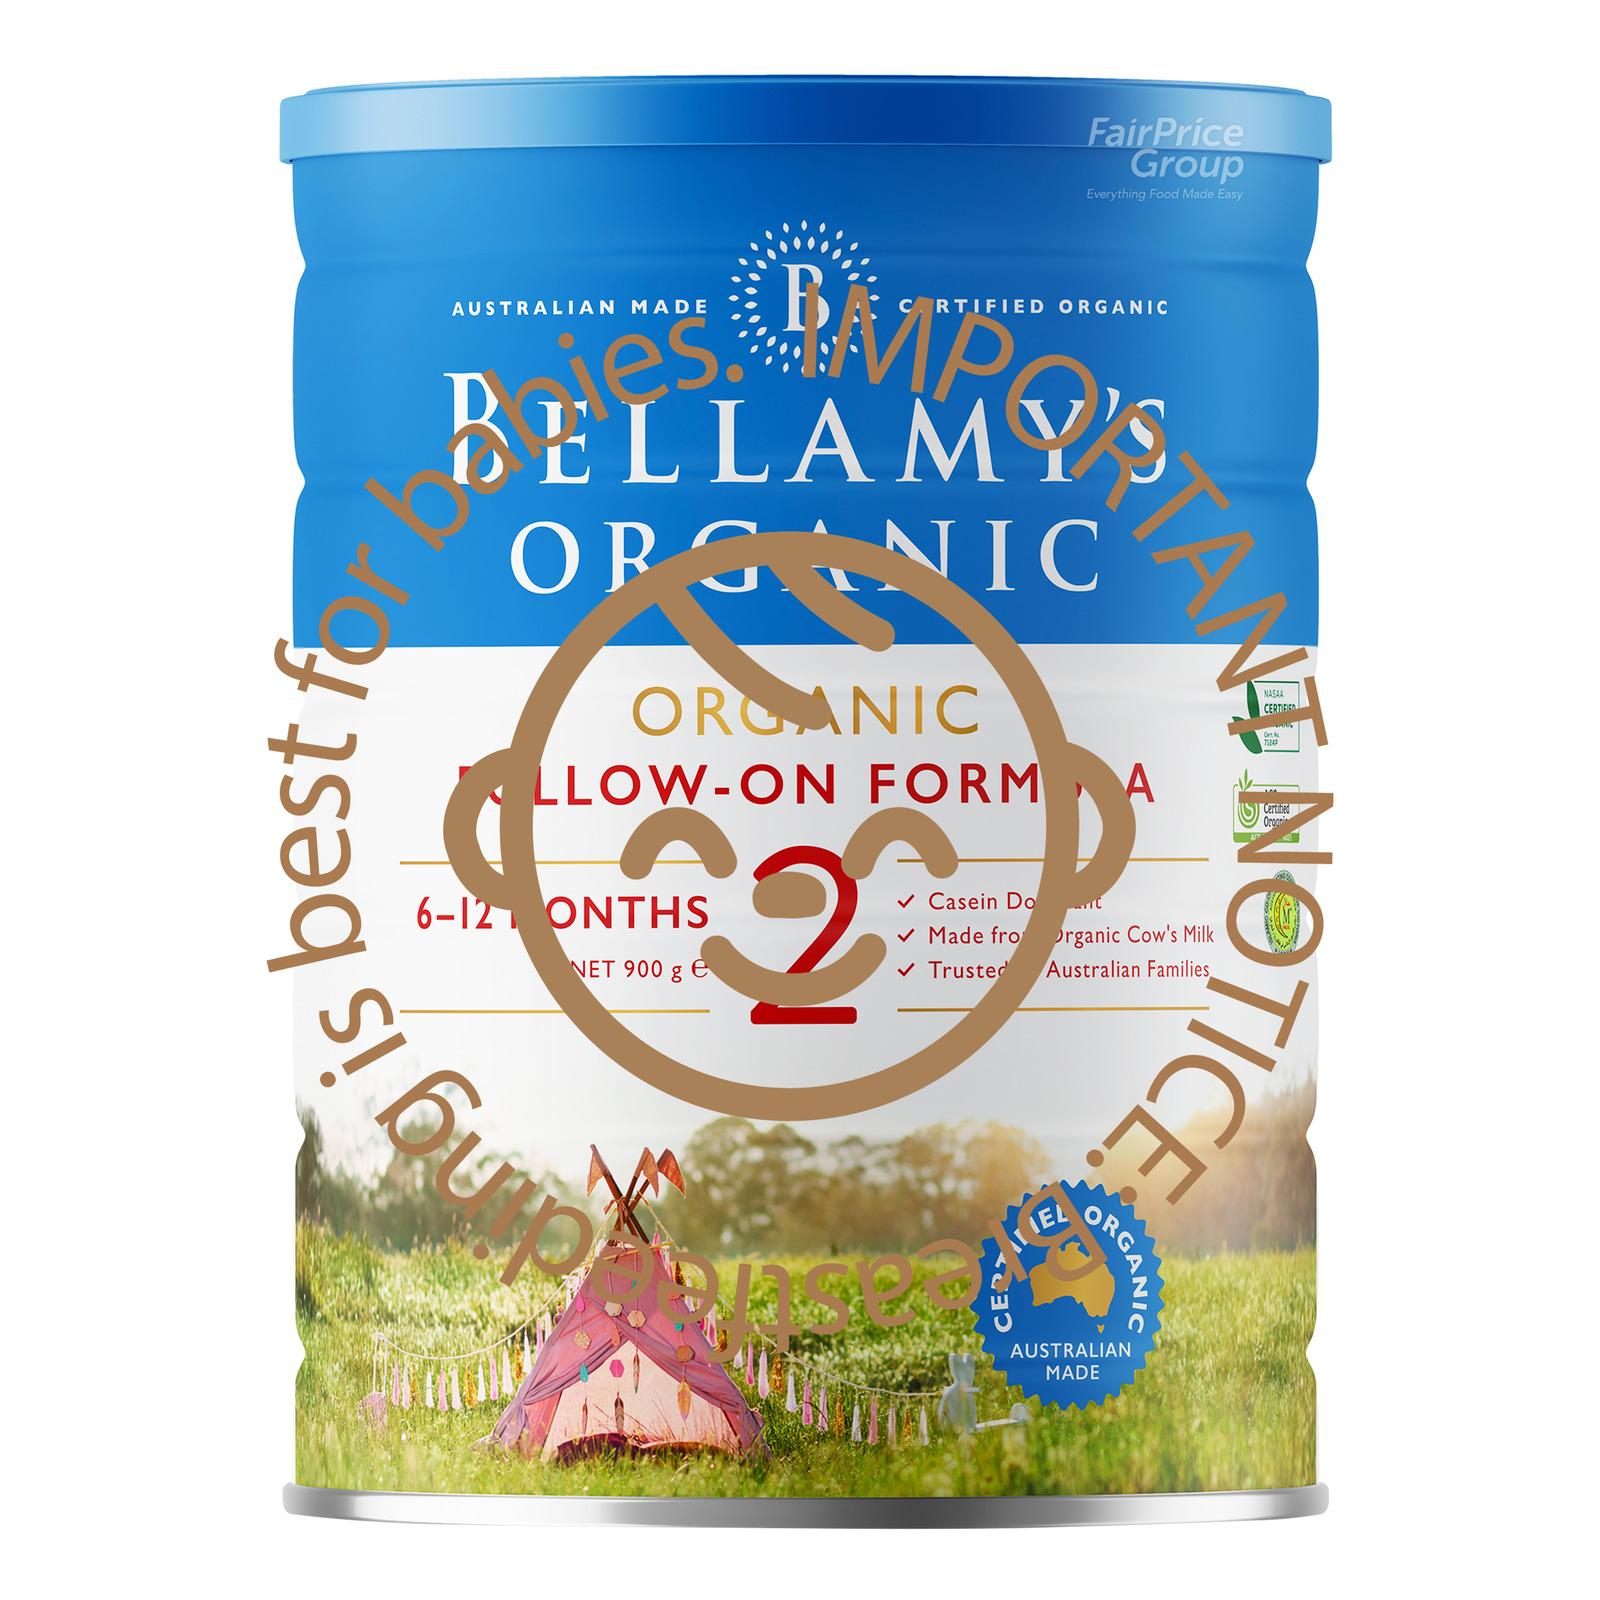 BELLAMYS ORGANIC organic step 2 follow on formula 900g